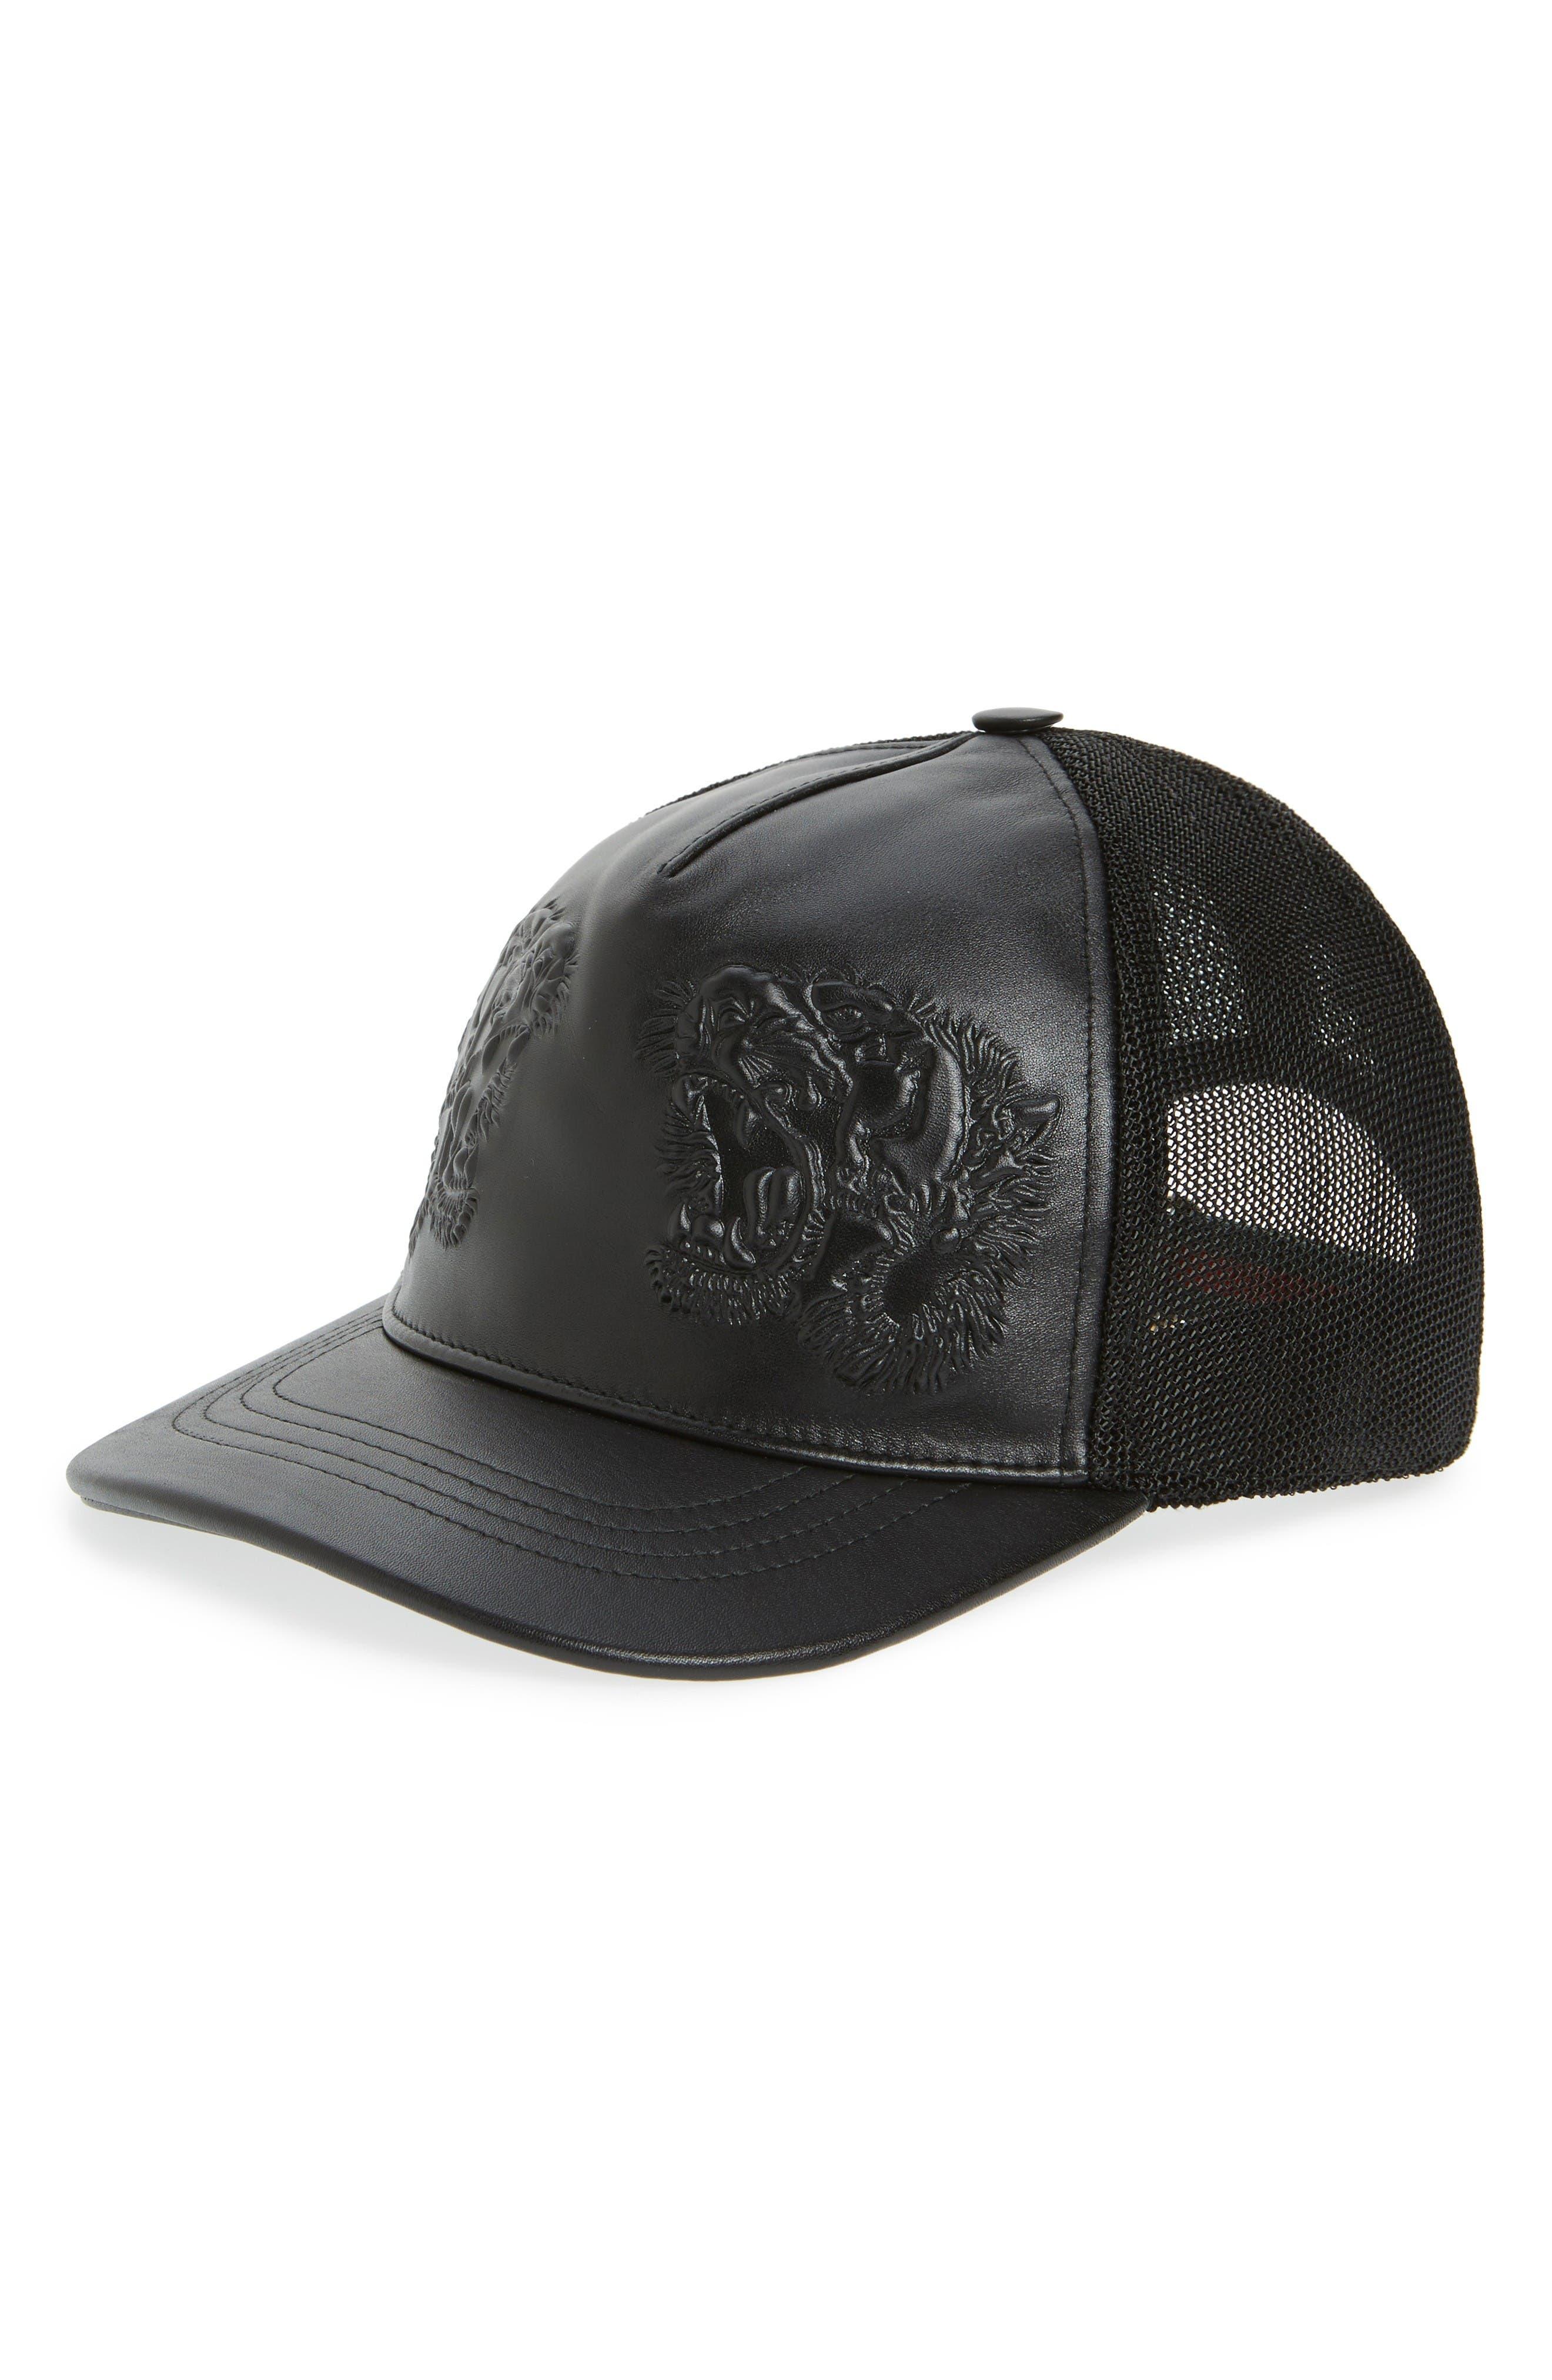 Main Image - Gucci Tiger Leather Baseball Cap